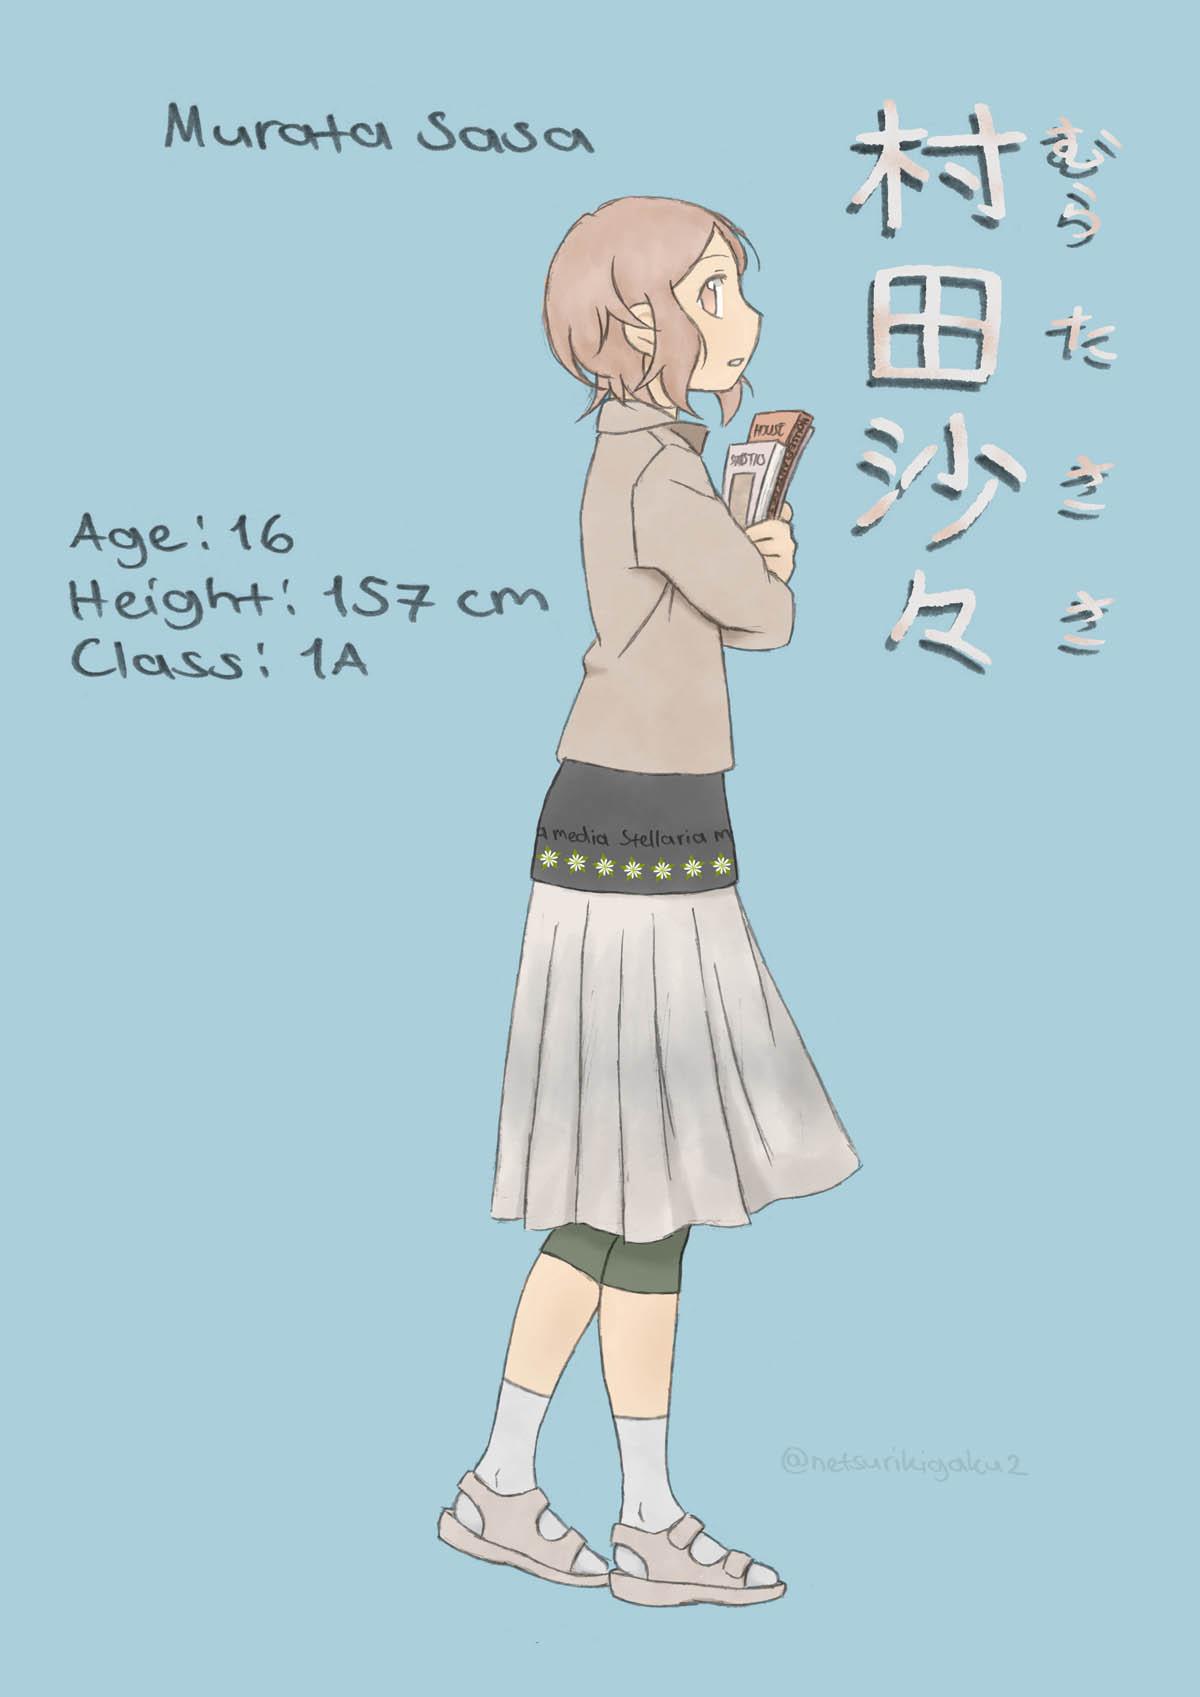 Character introduction of Murata Sasa